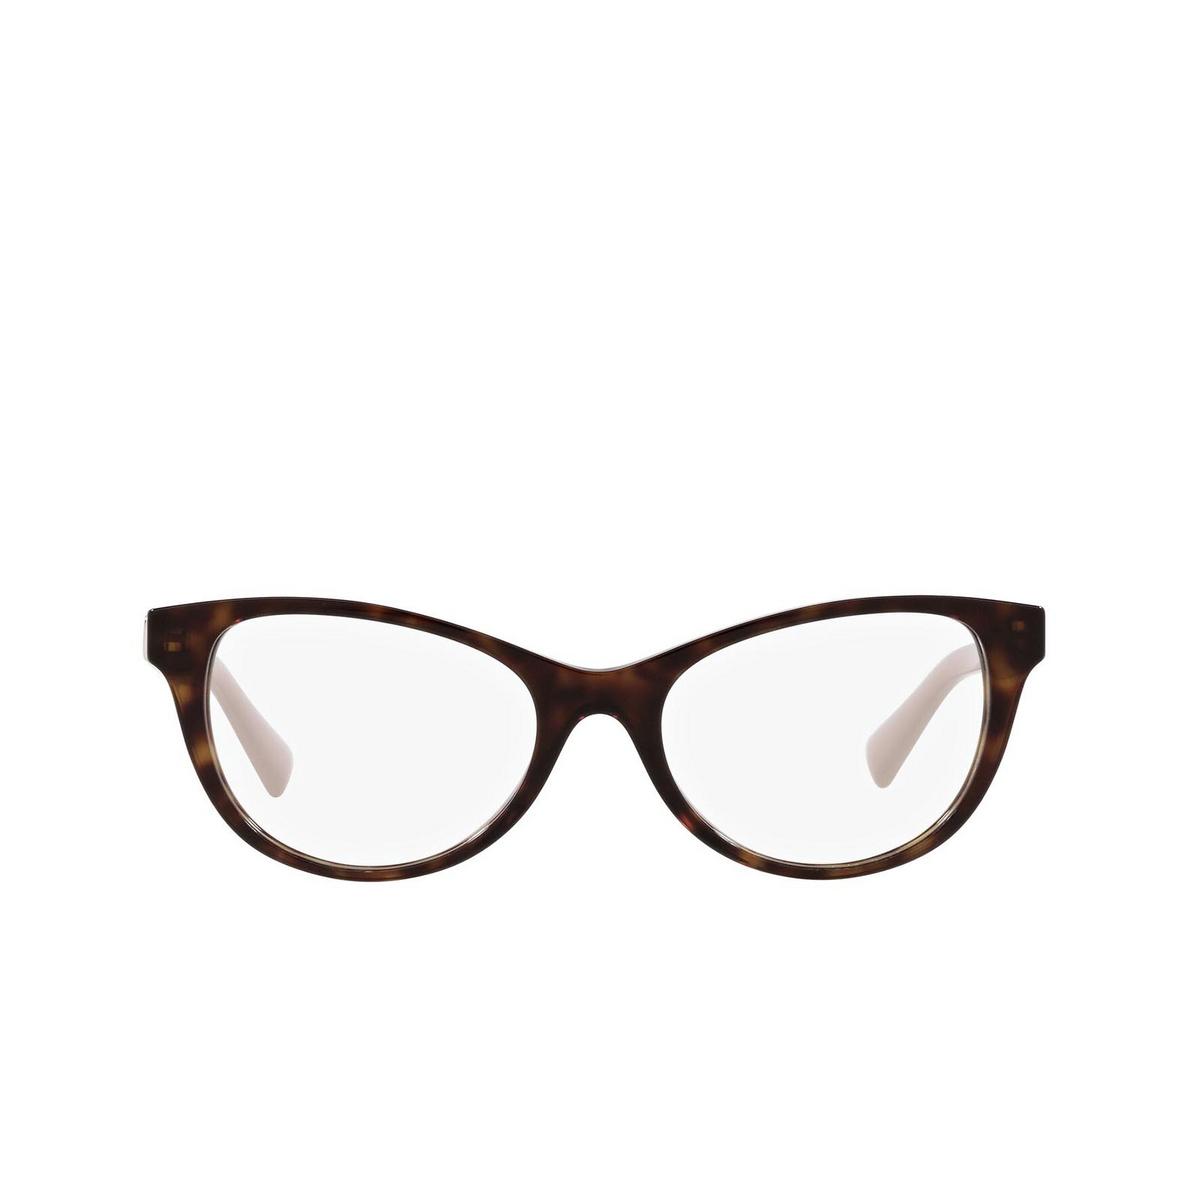 Valentino® Oval Eyeglasses: VA3057 color Havana 5002.